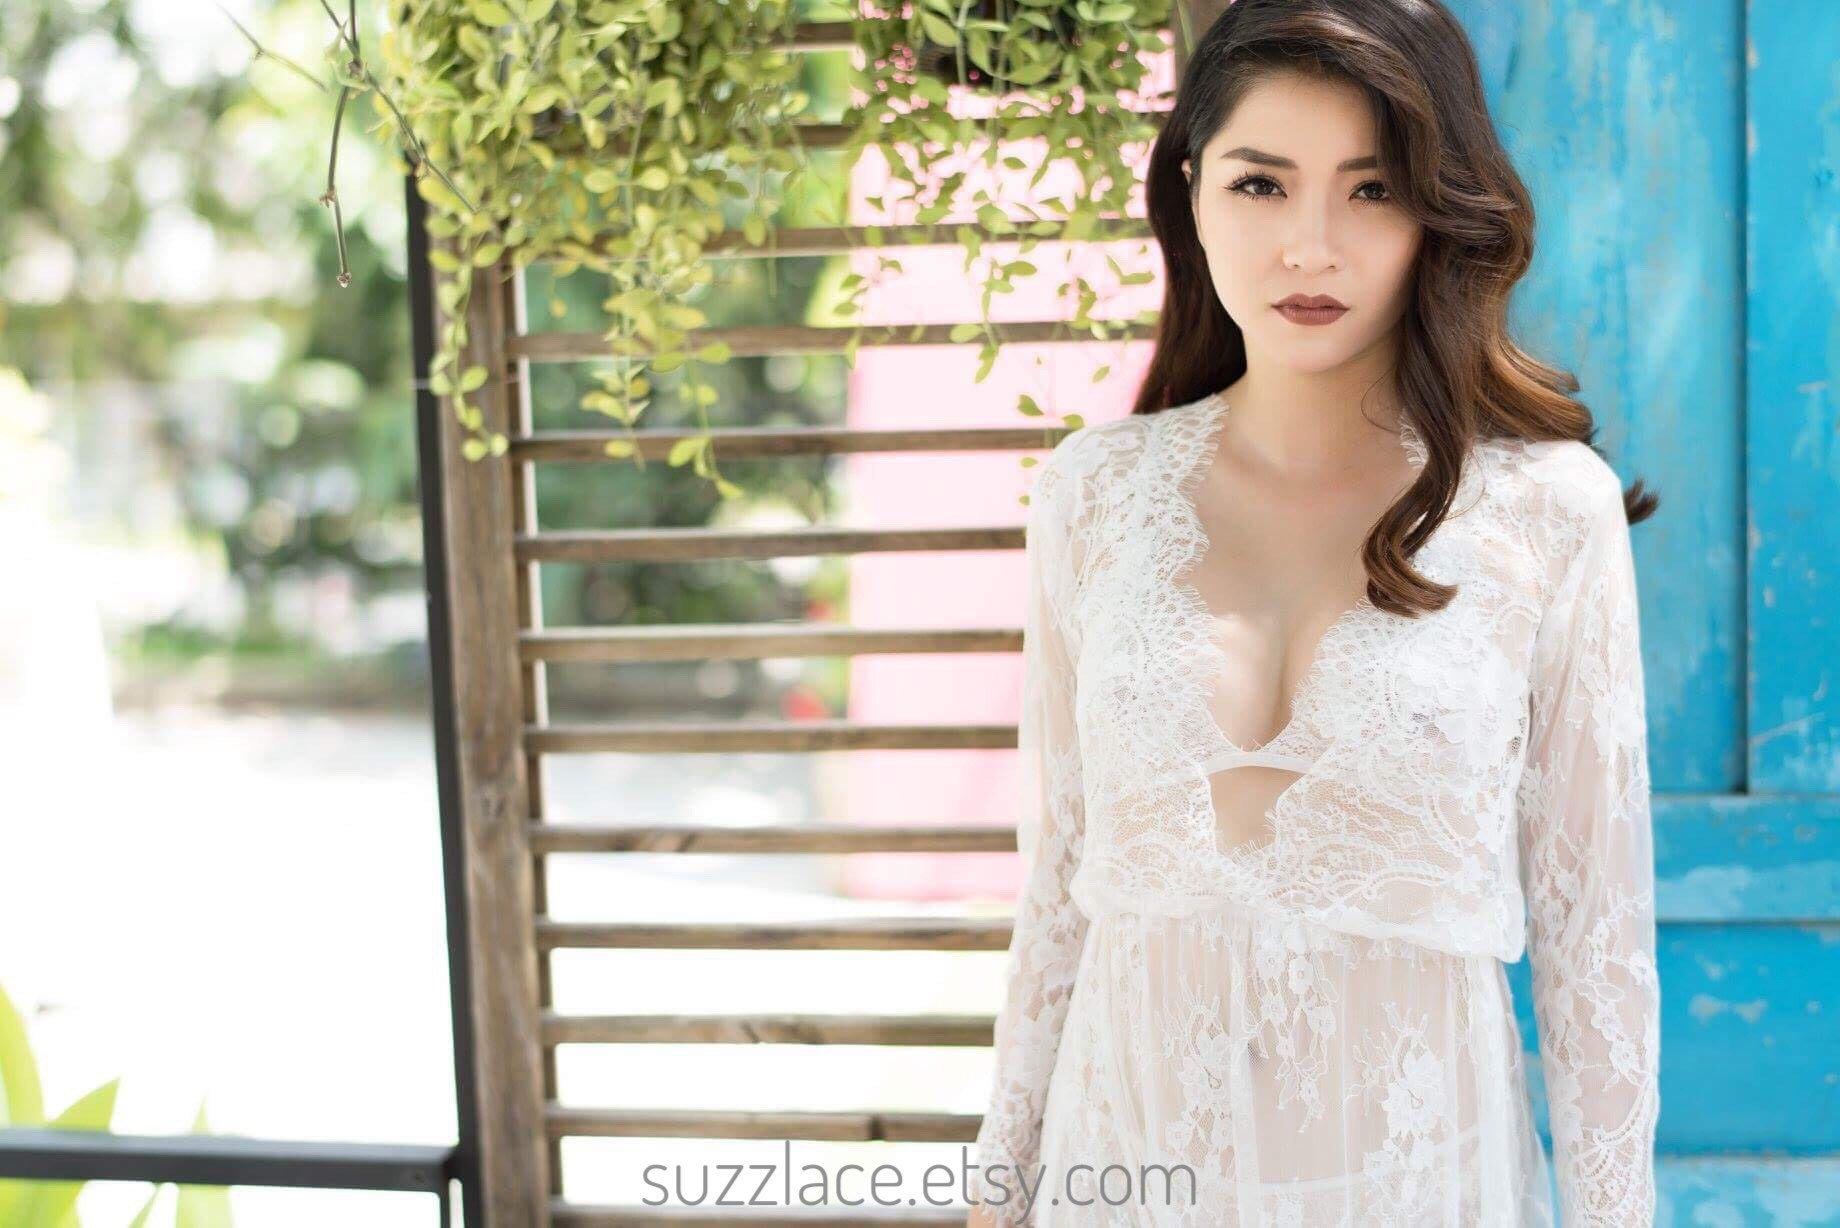 Lingerie Long Sleeve Lace Maternity Dress Photoshoot Prop